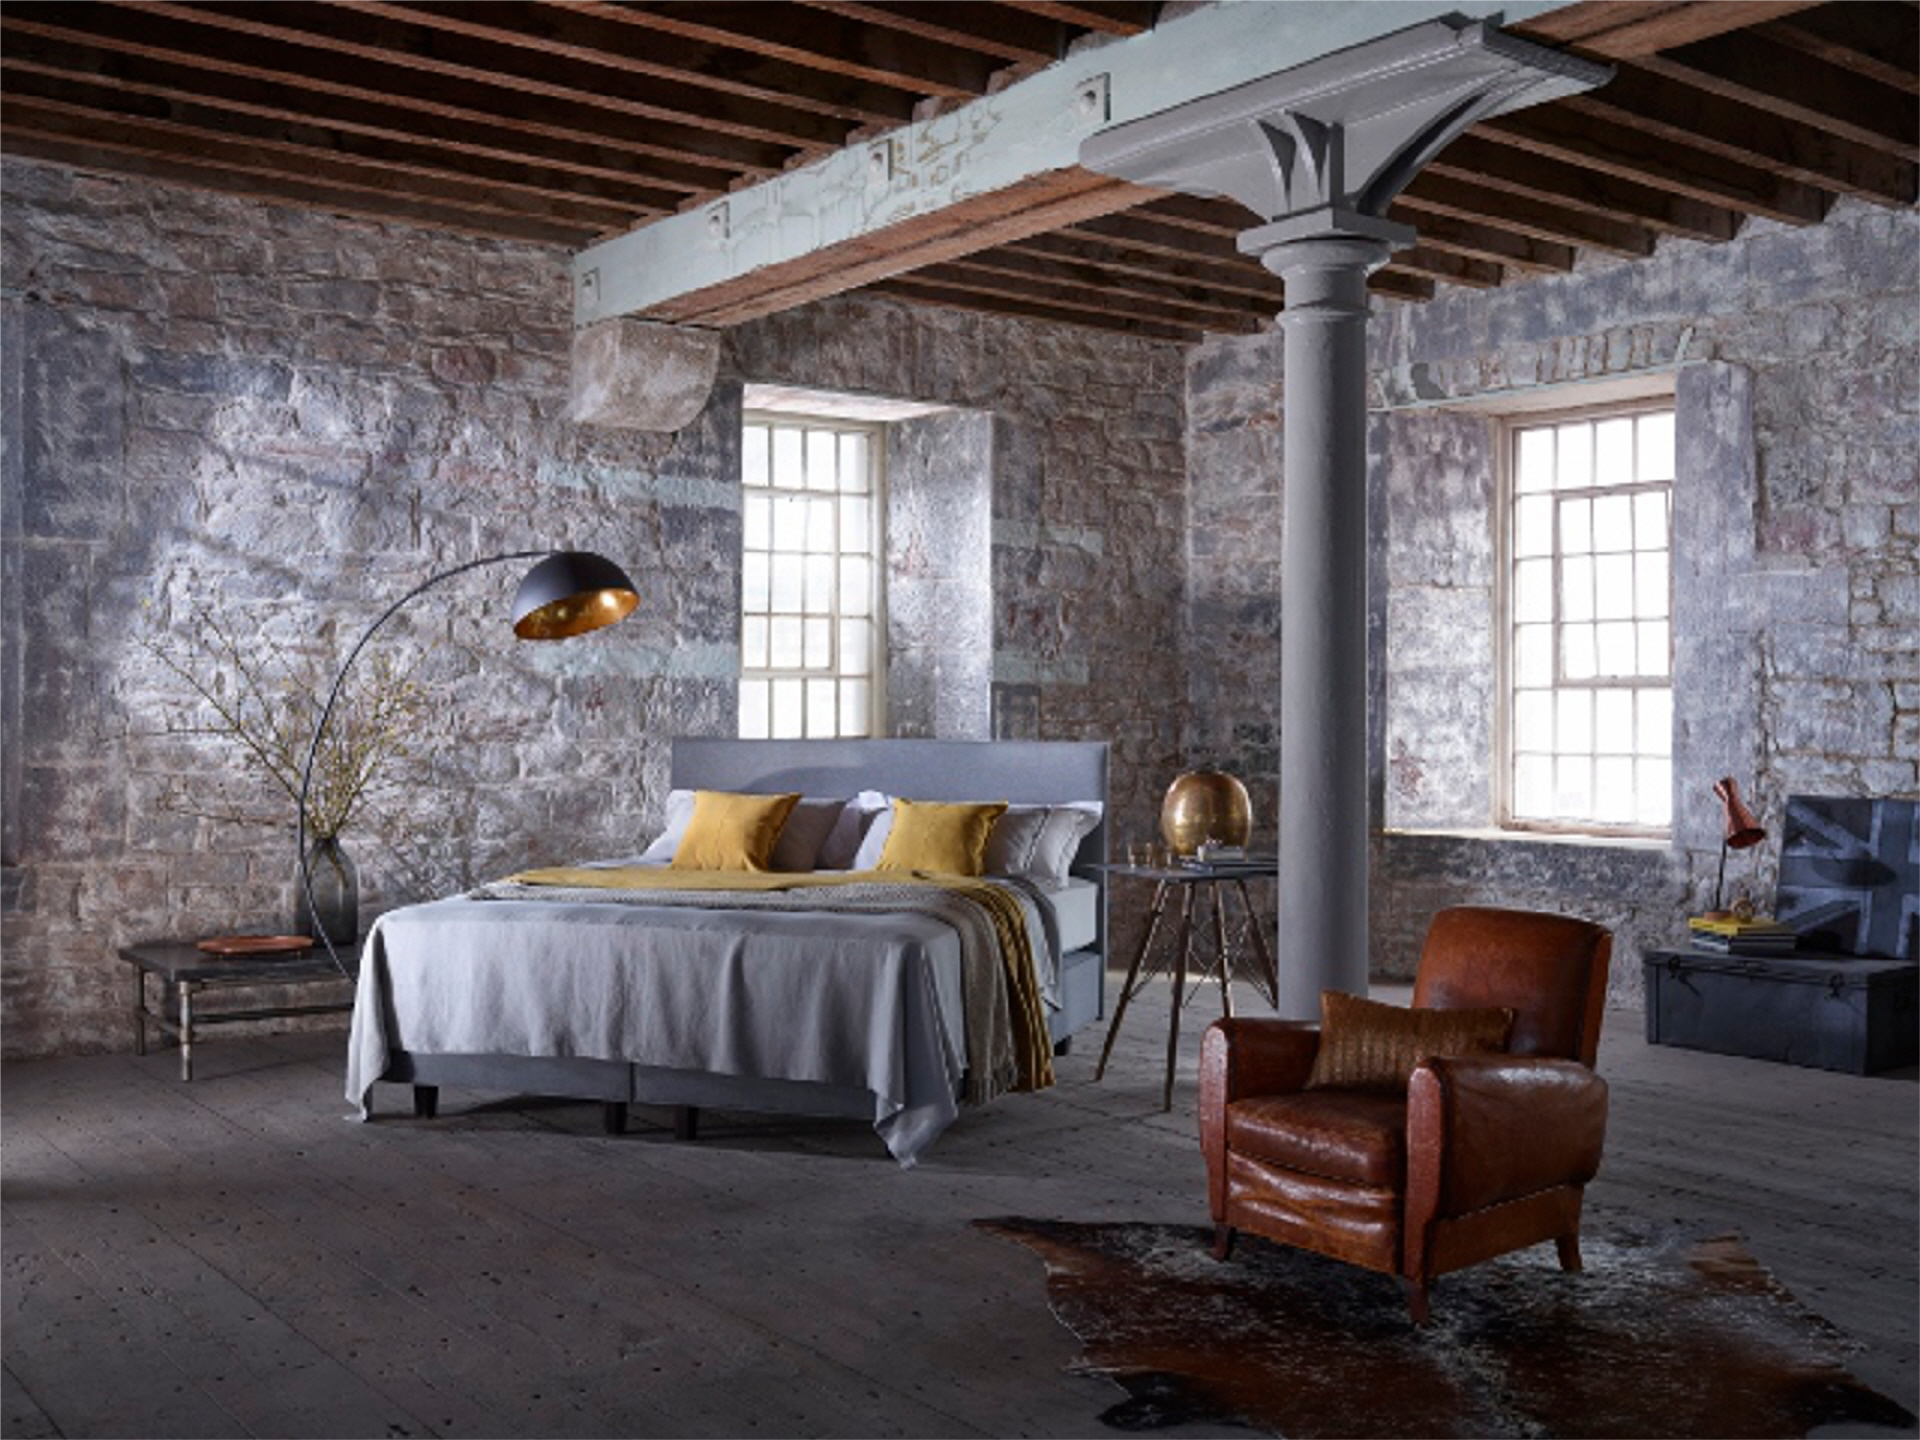 betten concept store m nchen. Black Bedroom Furniture Sets. Home Design Ideas